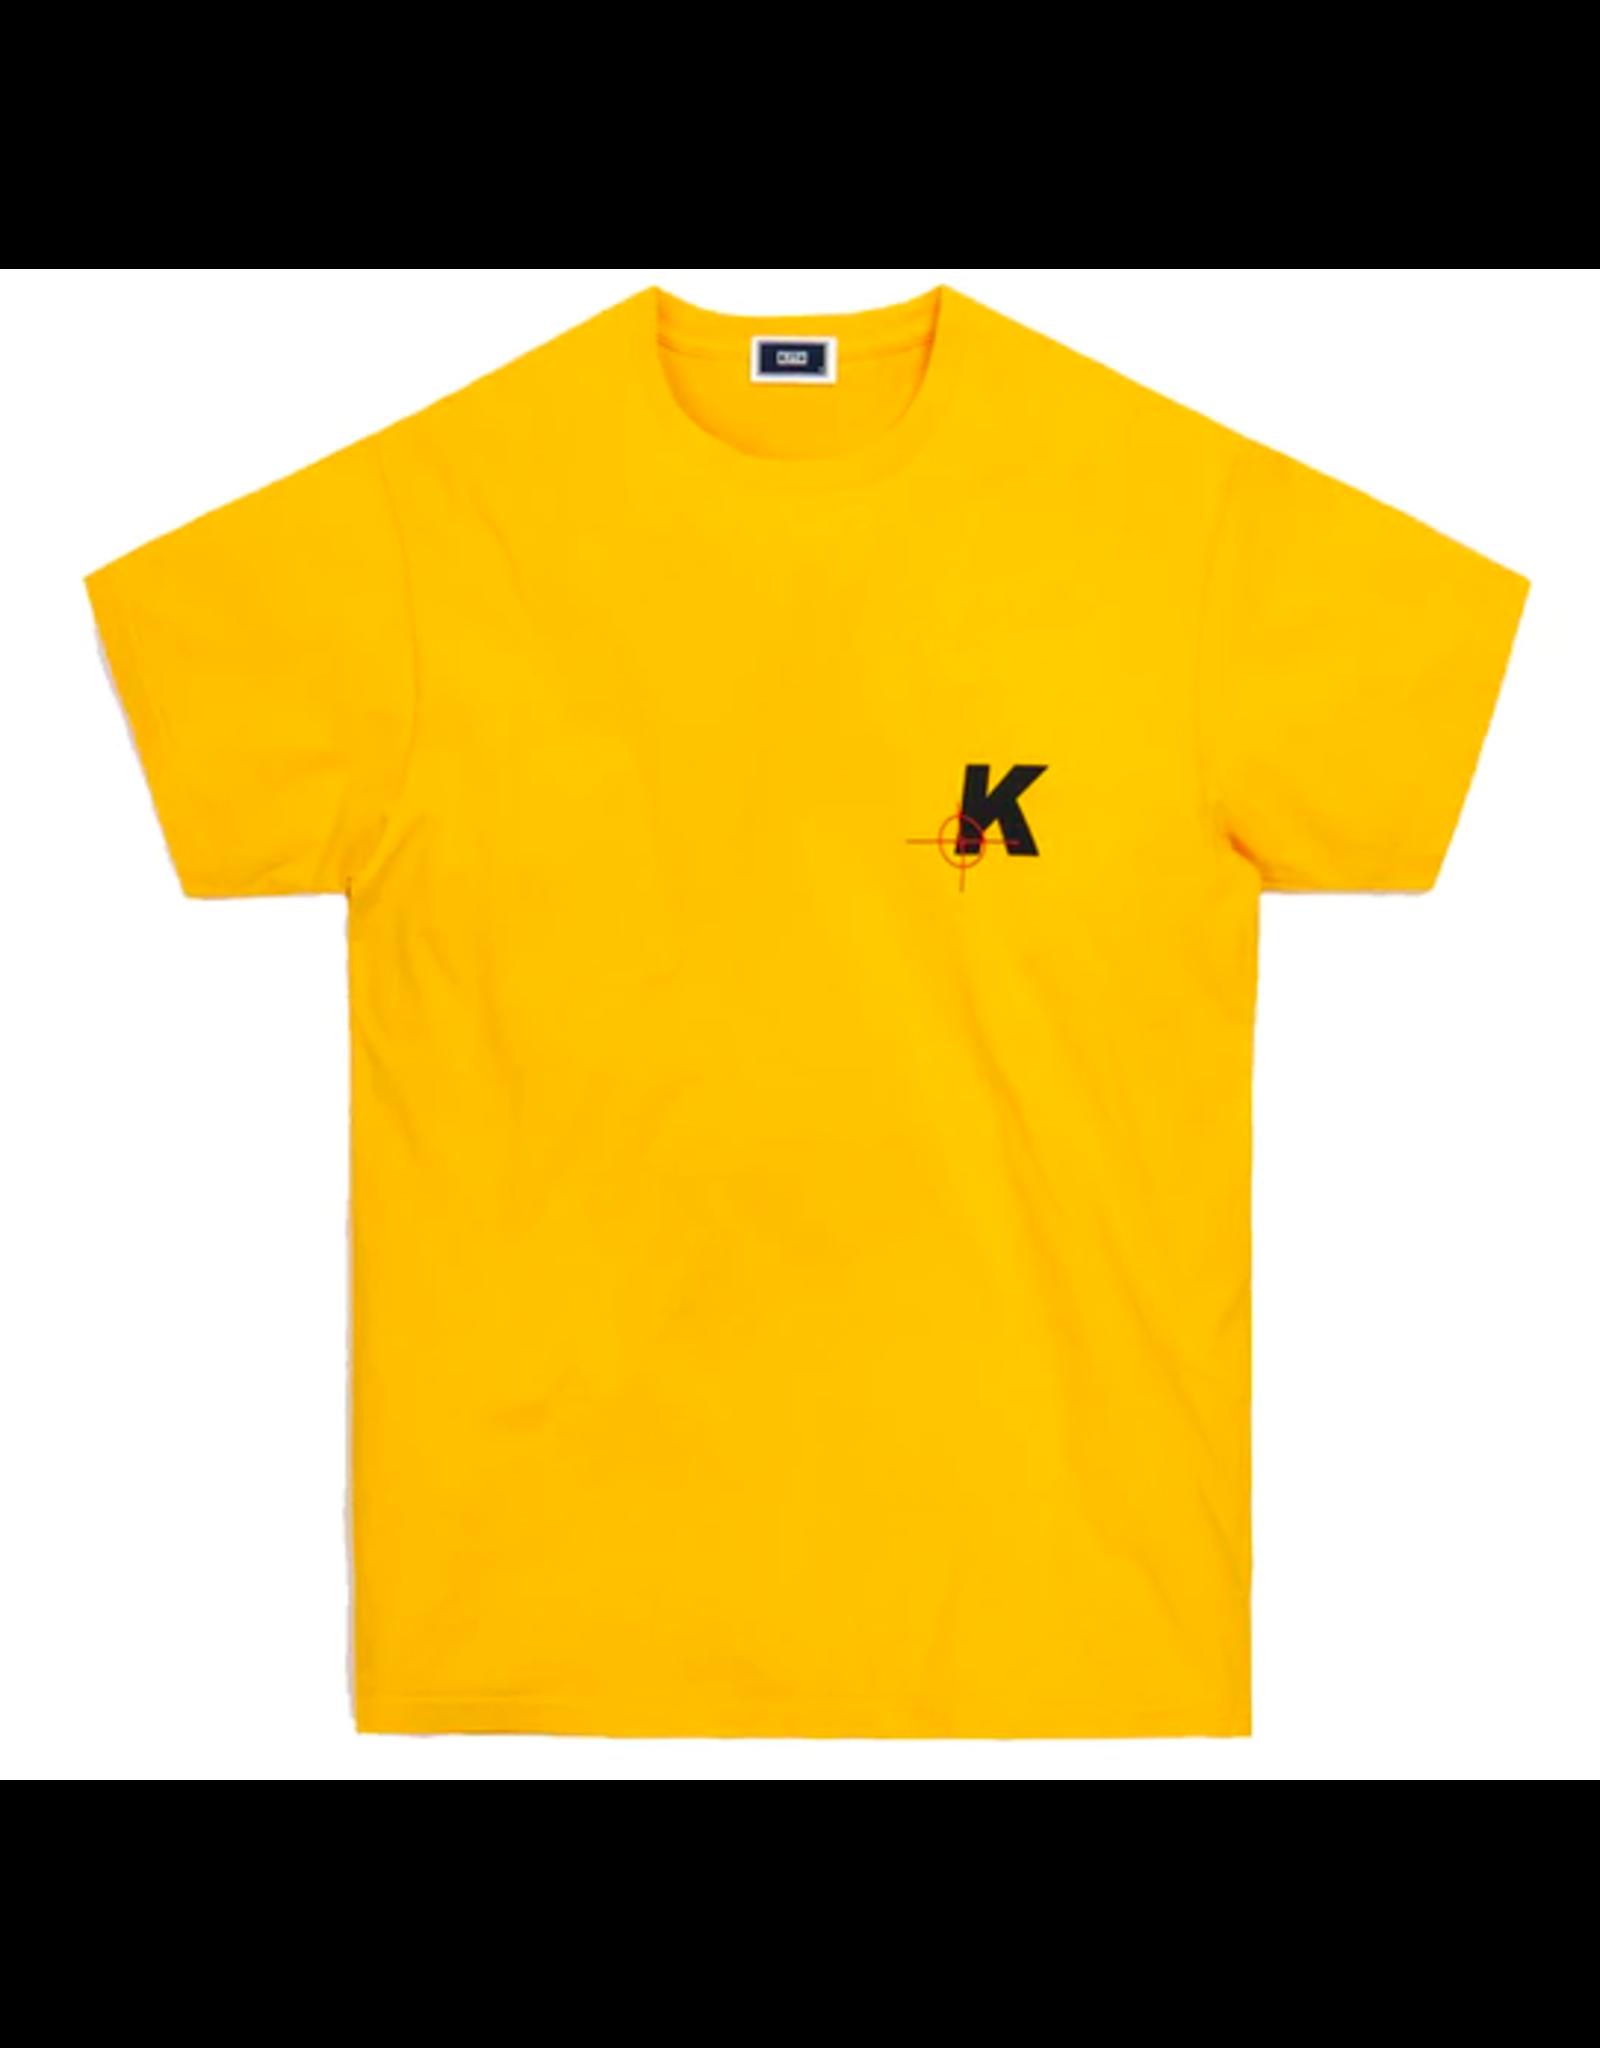 Kith On Target Tee Yellow - XL